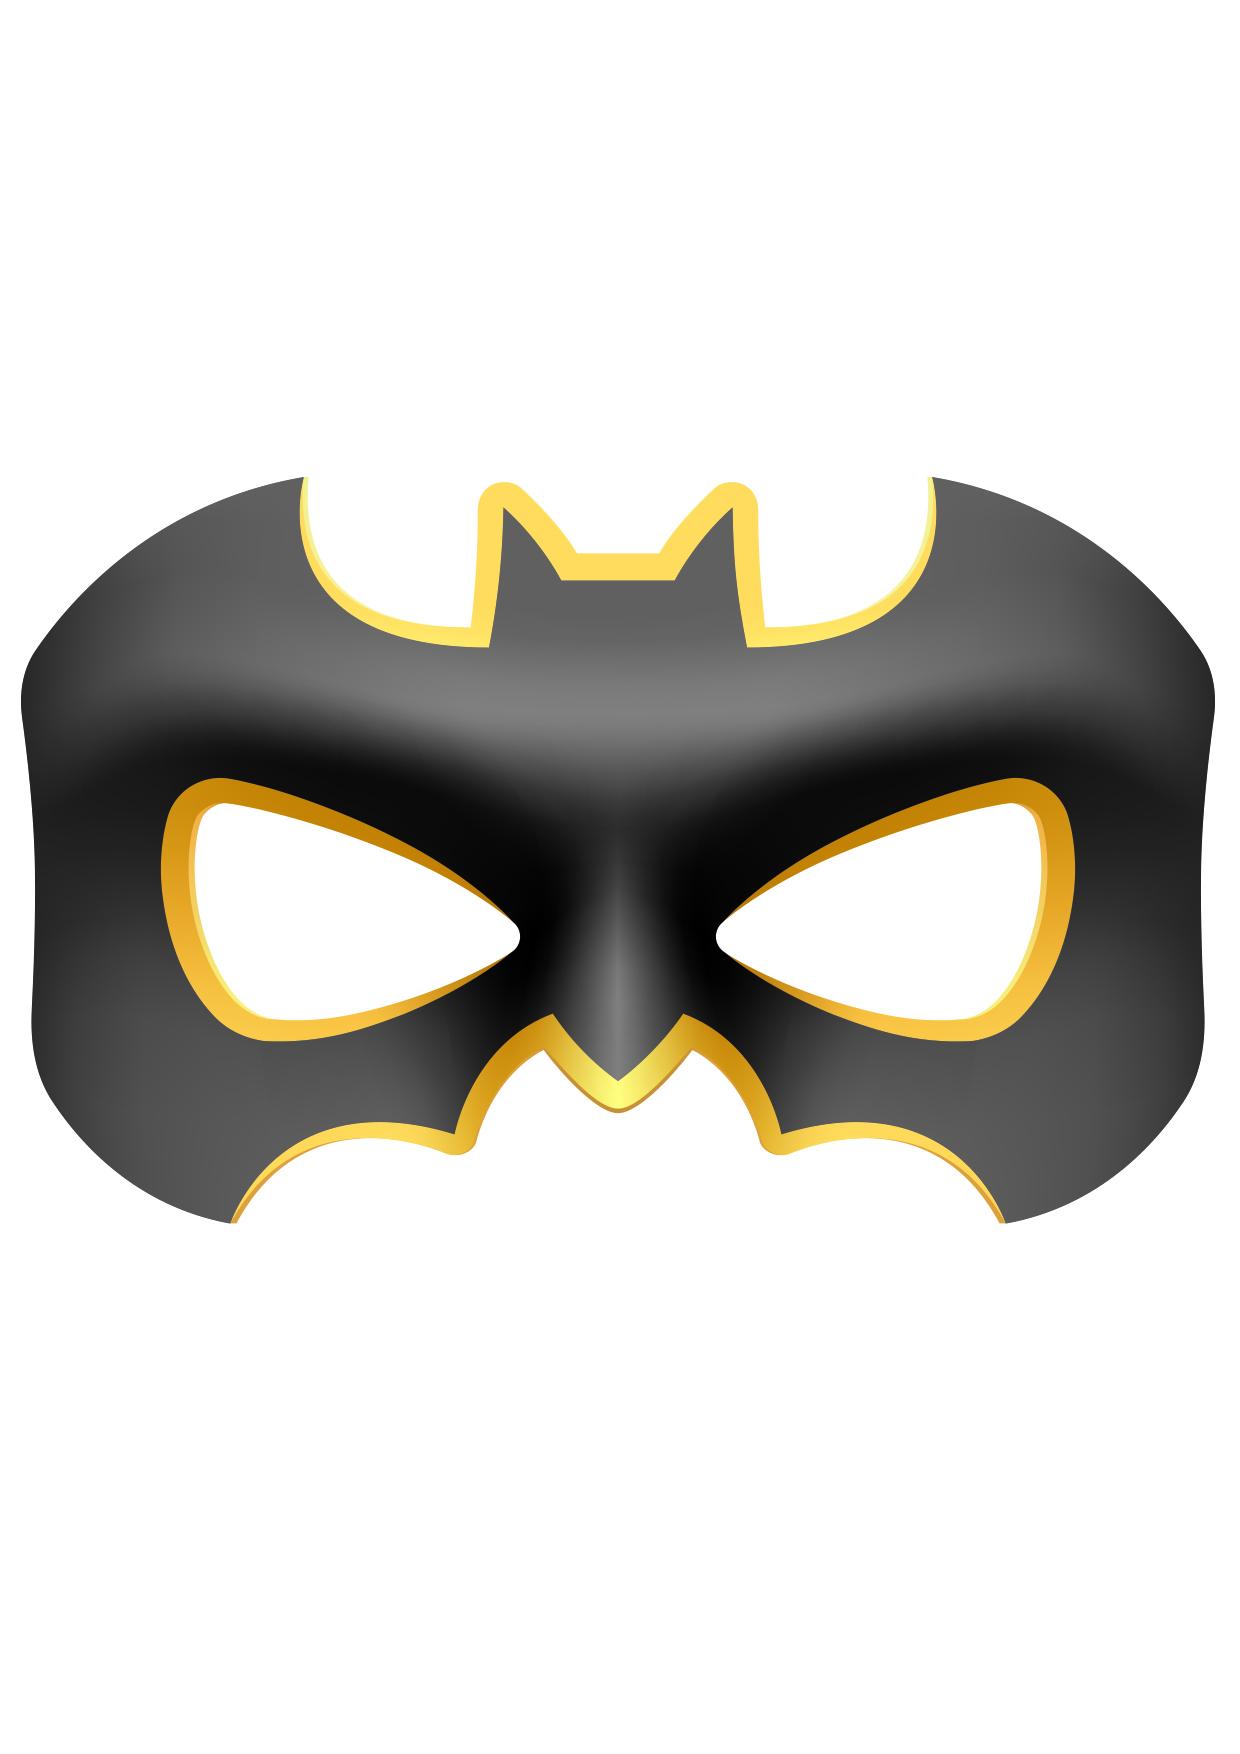 Impressionnant dessin colorier masque de carnaval - Masque spiderman a imprimer ...